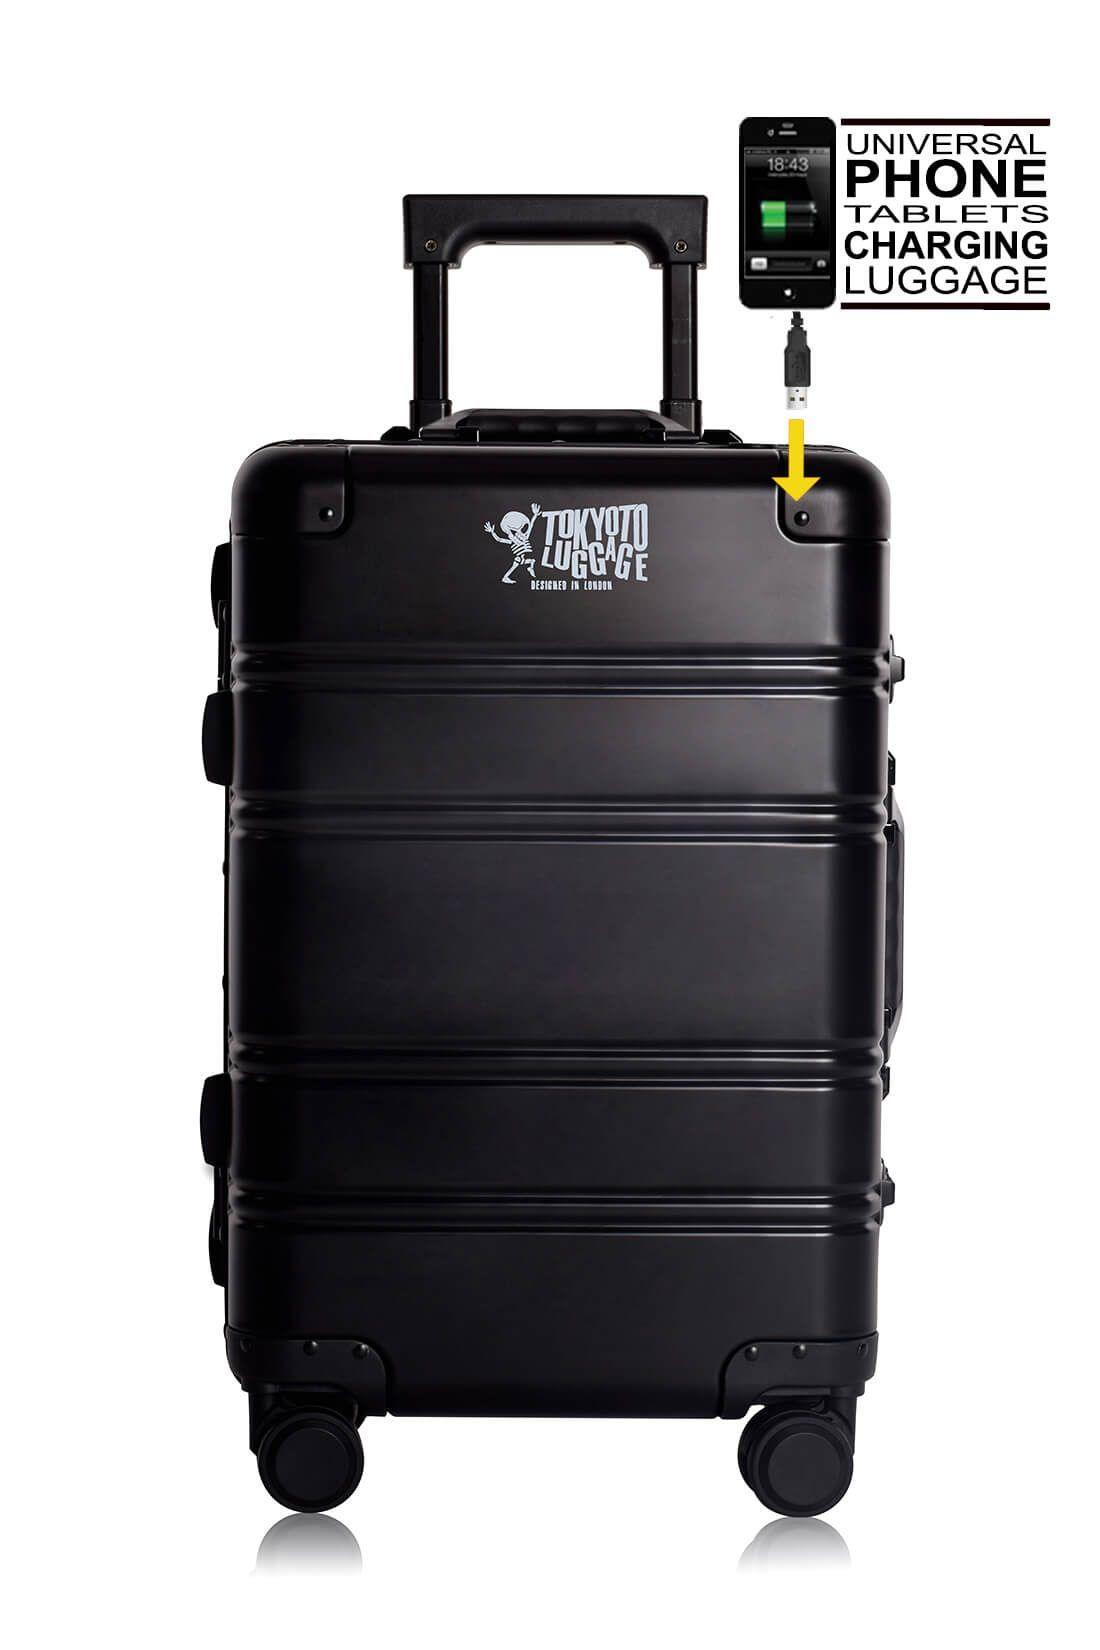 Valise Aluminium Online Cabine Trolley Avec Chargeur Powerbank TOKYOTO LUGGAGE Modelle BLACK LOGO 1